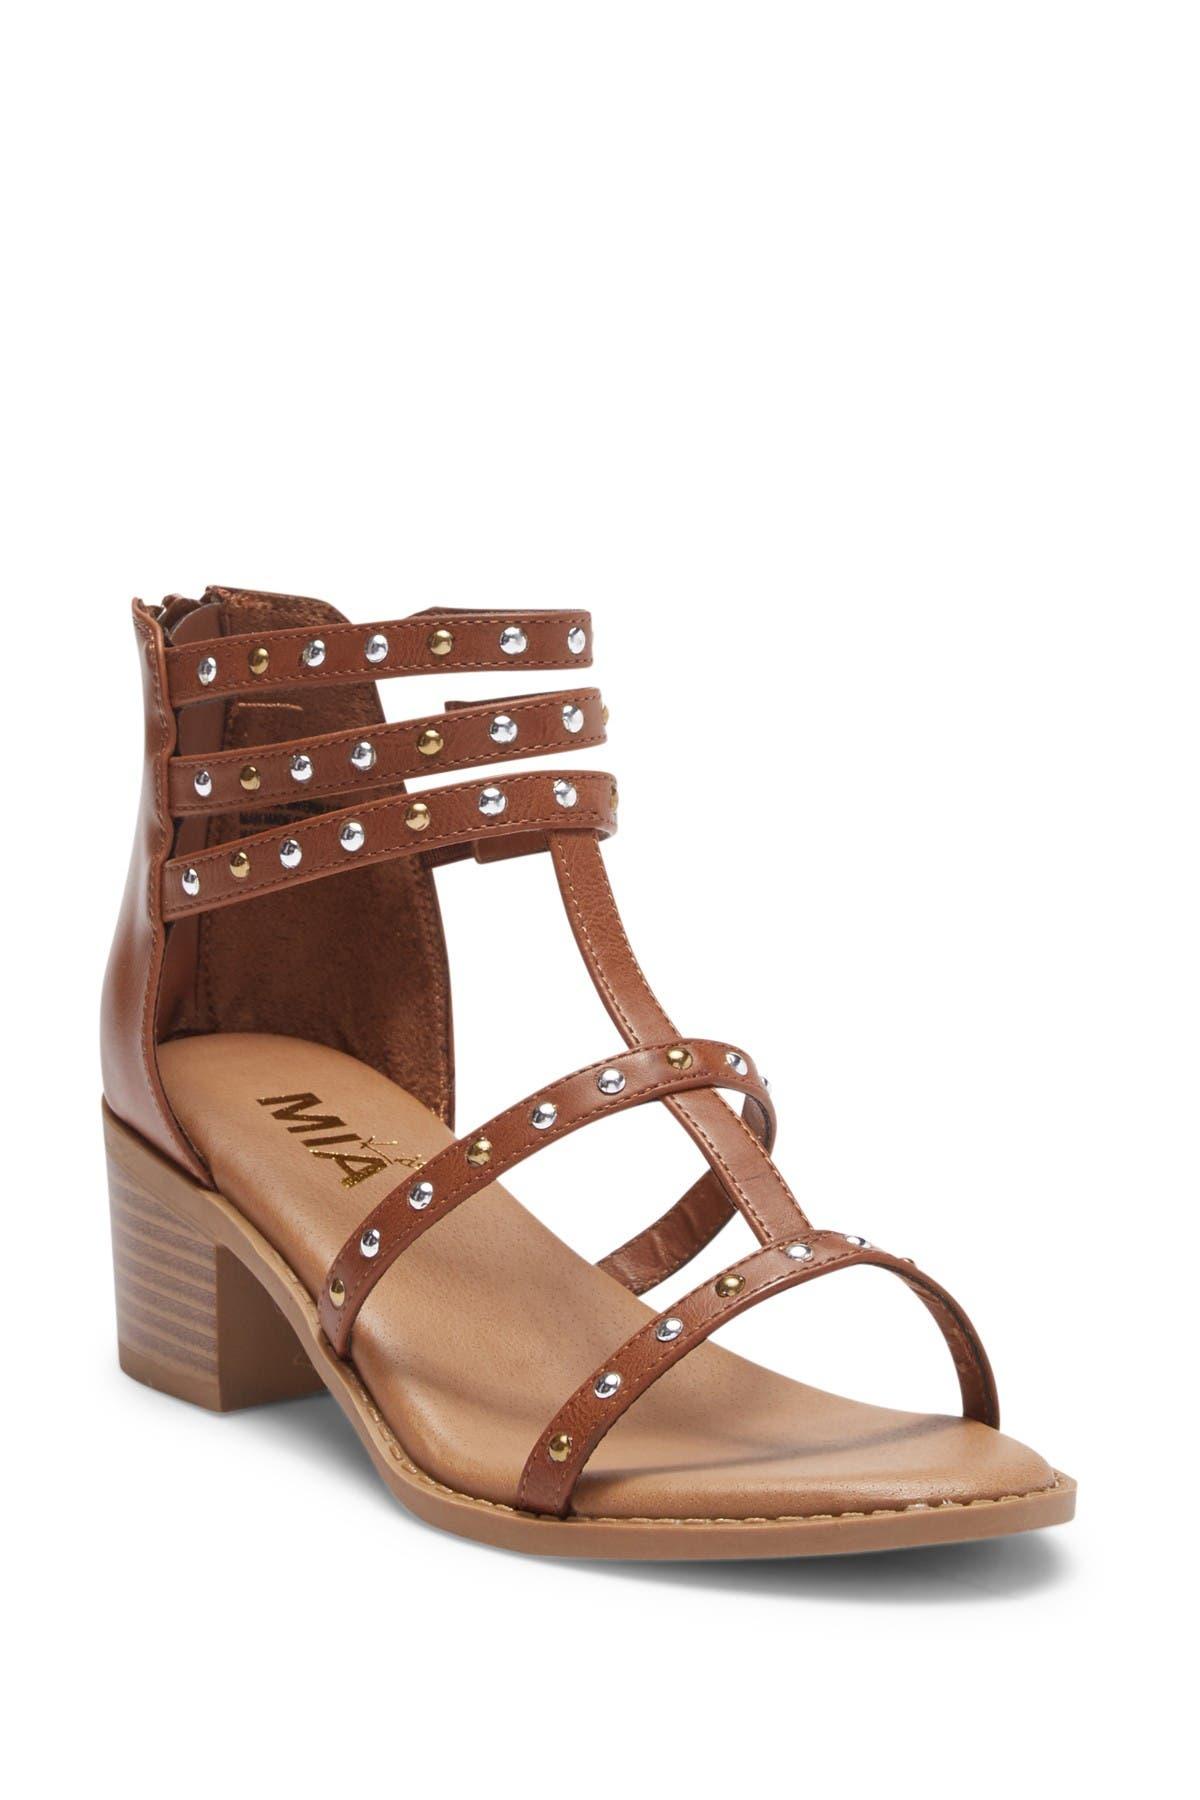 Image of MIA Beatriz Block Heel Sandal